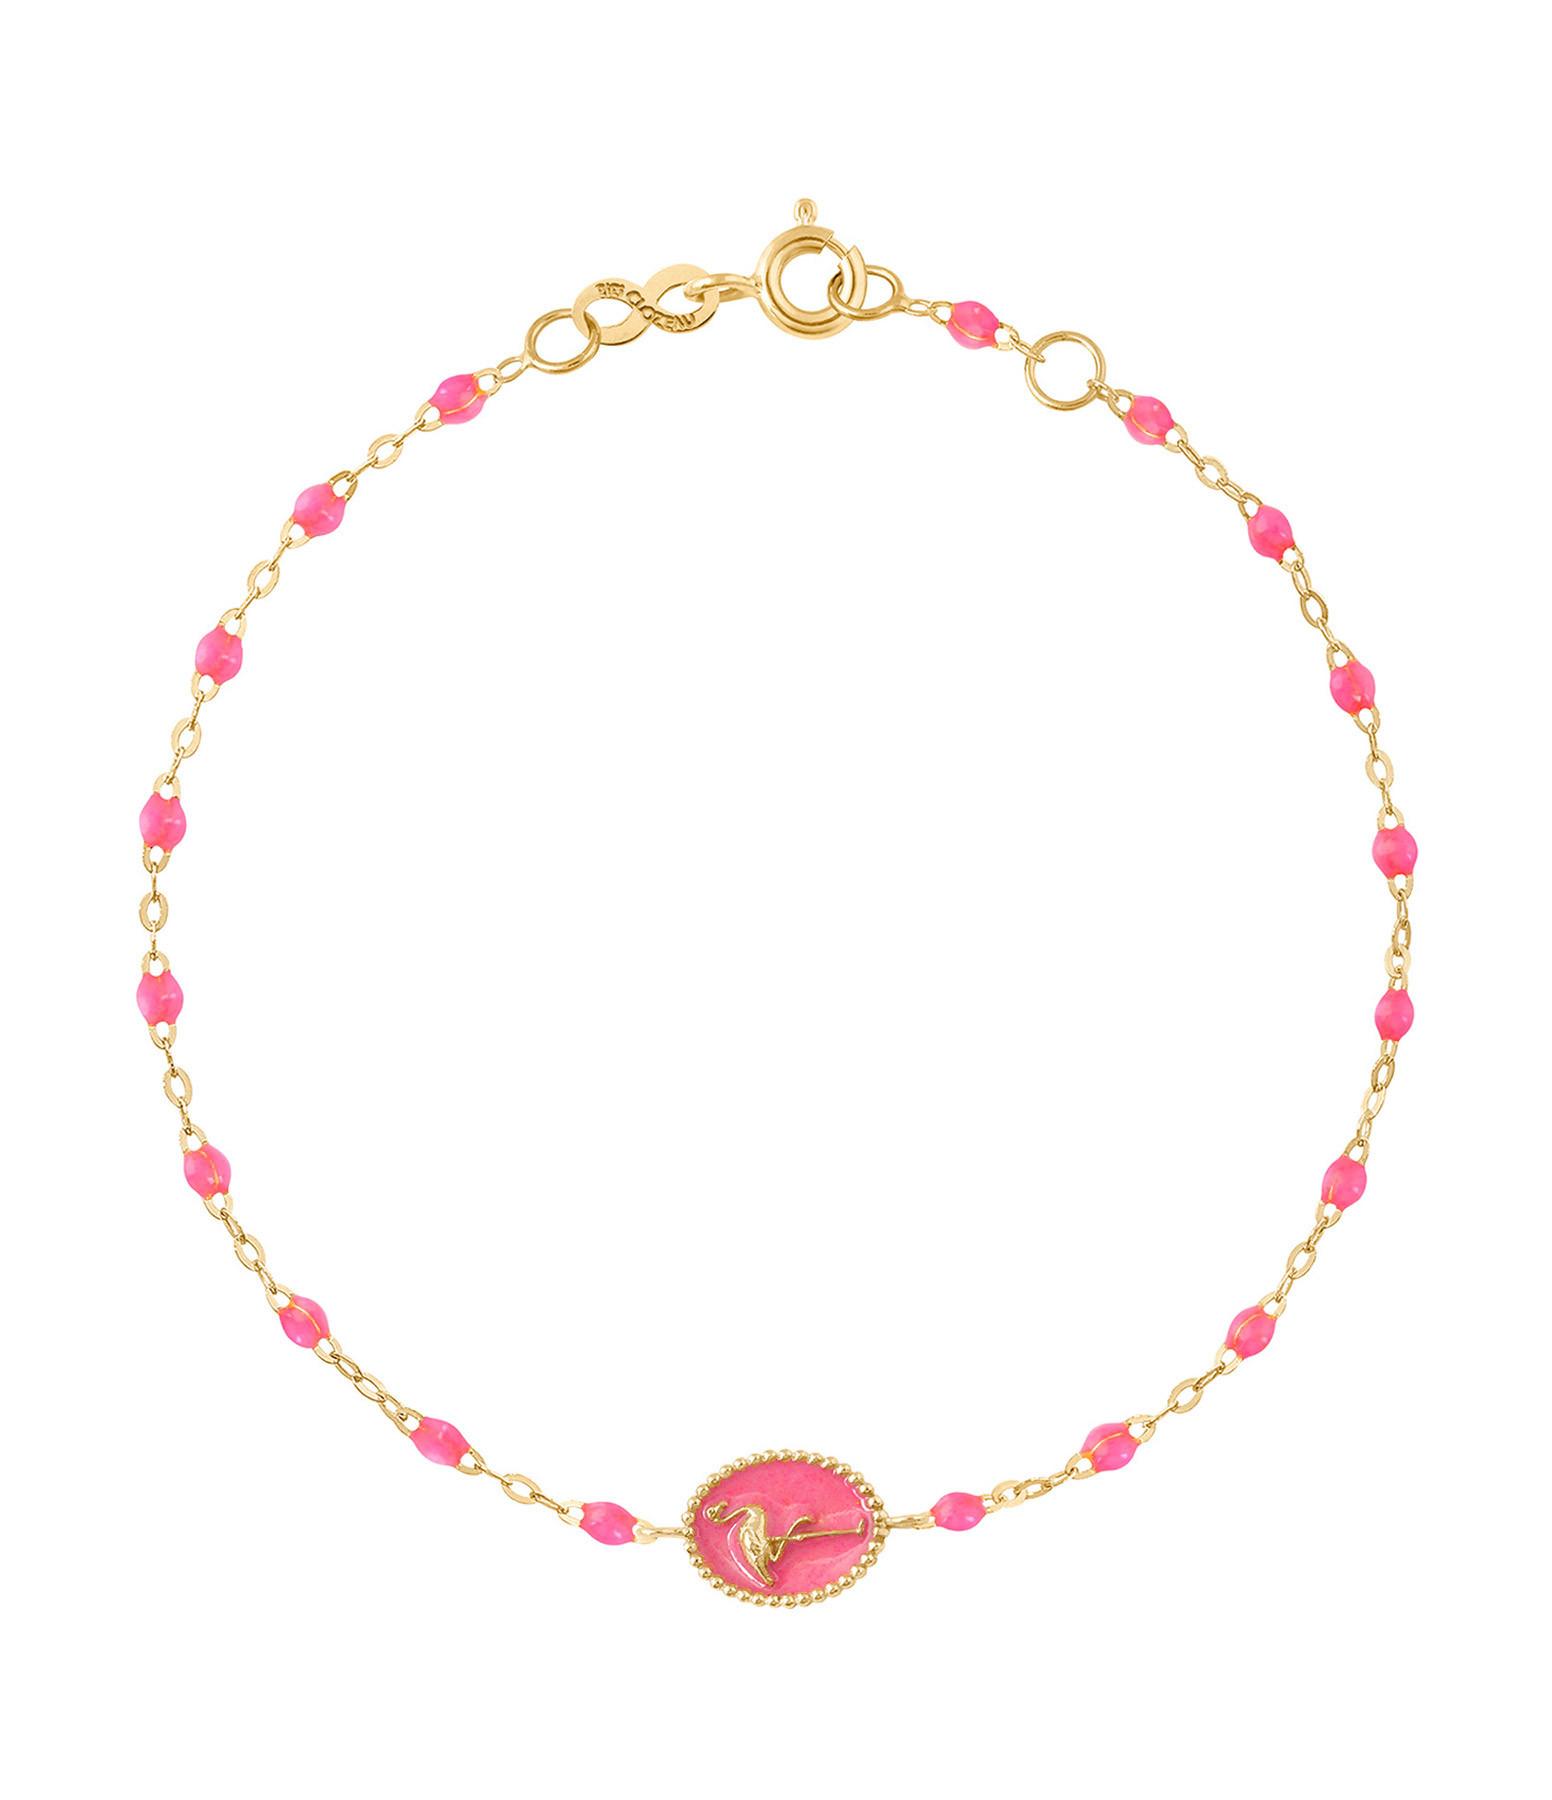 GIGI CLOZEAU - Bracelet Flamant Rose Perles Résine OJ Rose Fluo